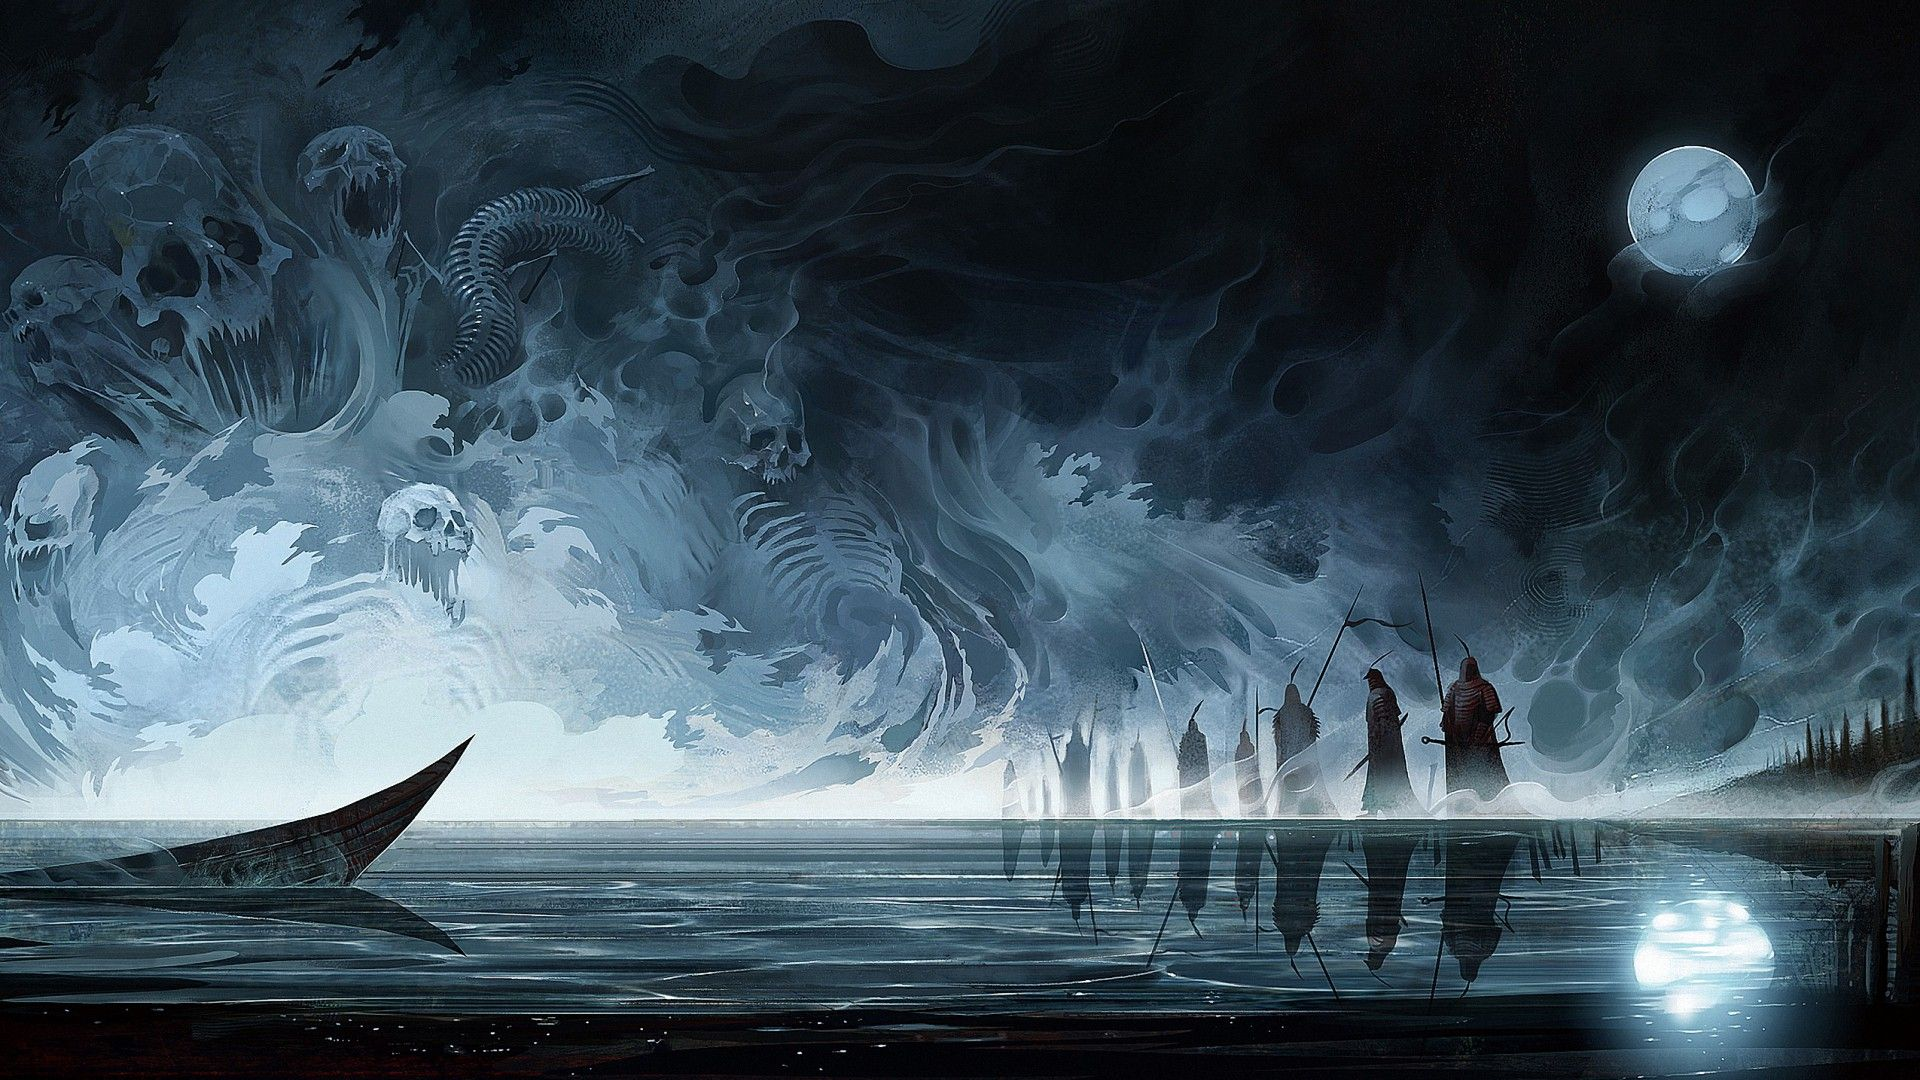 Dark Fantasy, River Stiks Art, Hazea wallpaper